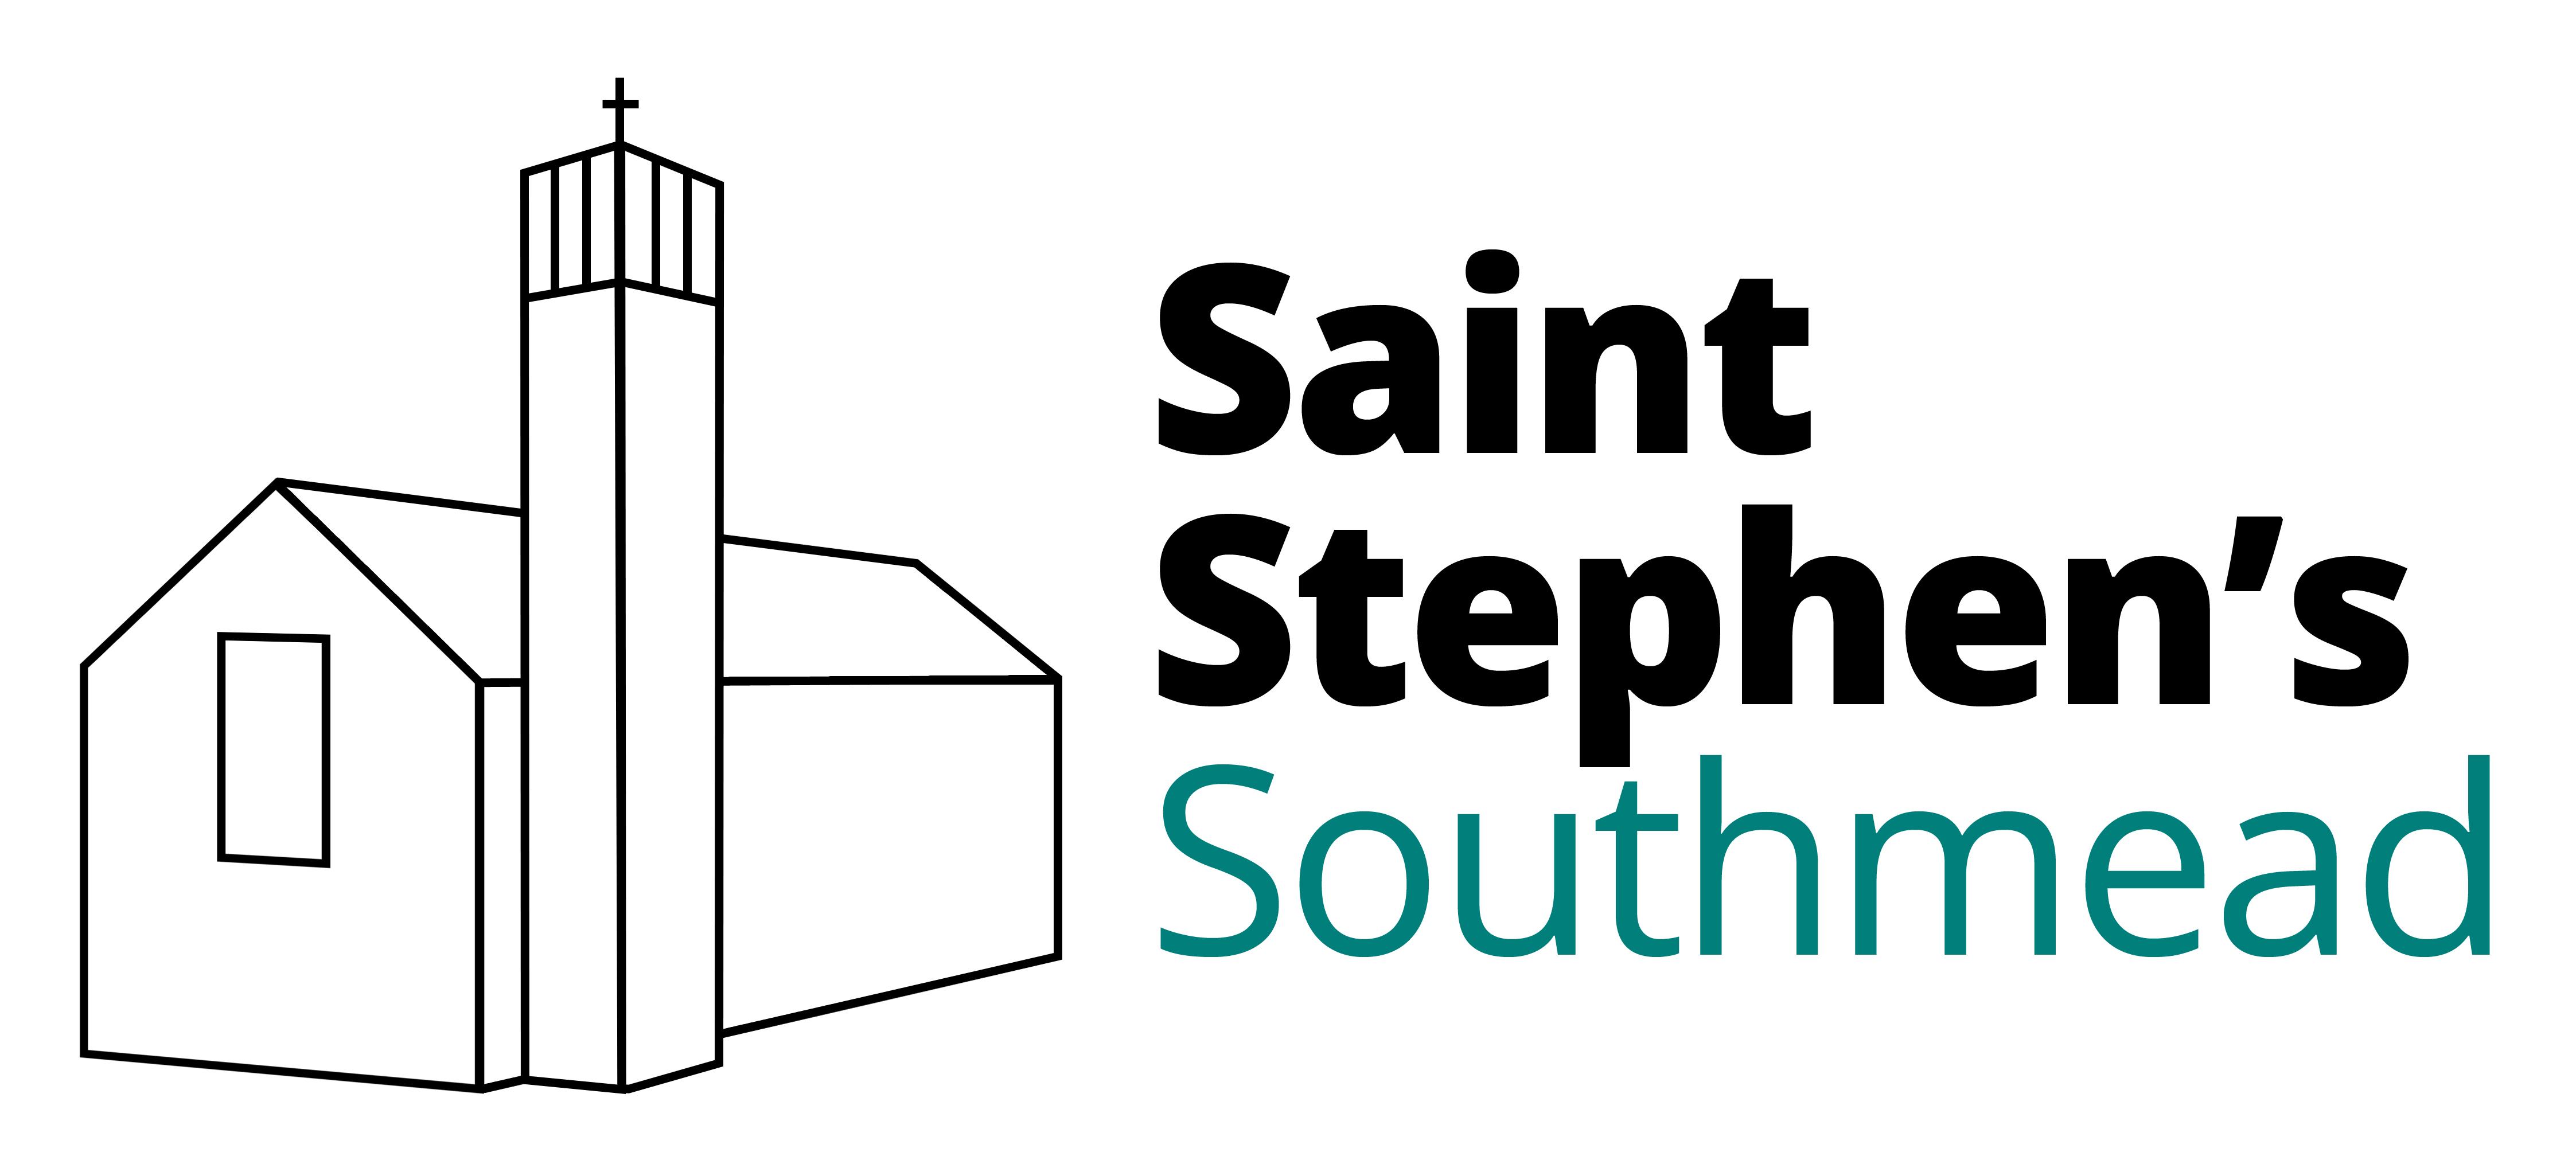 St Stephen's Southmead